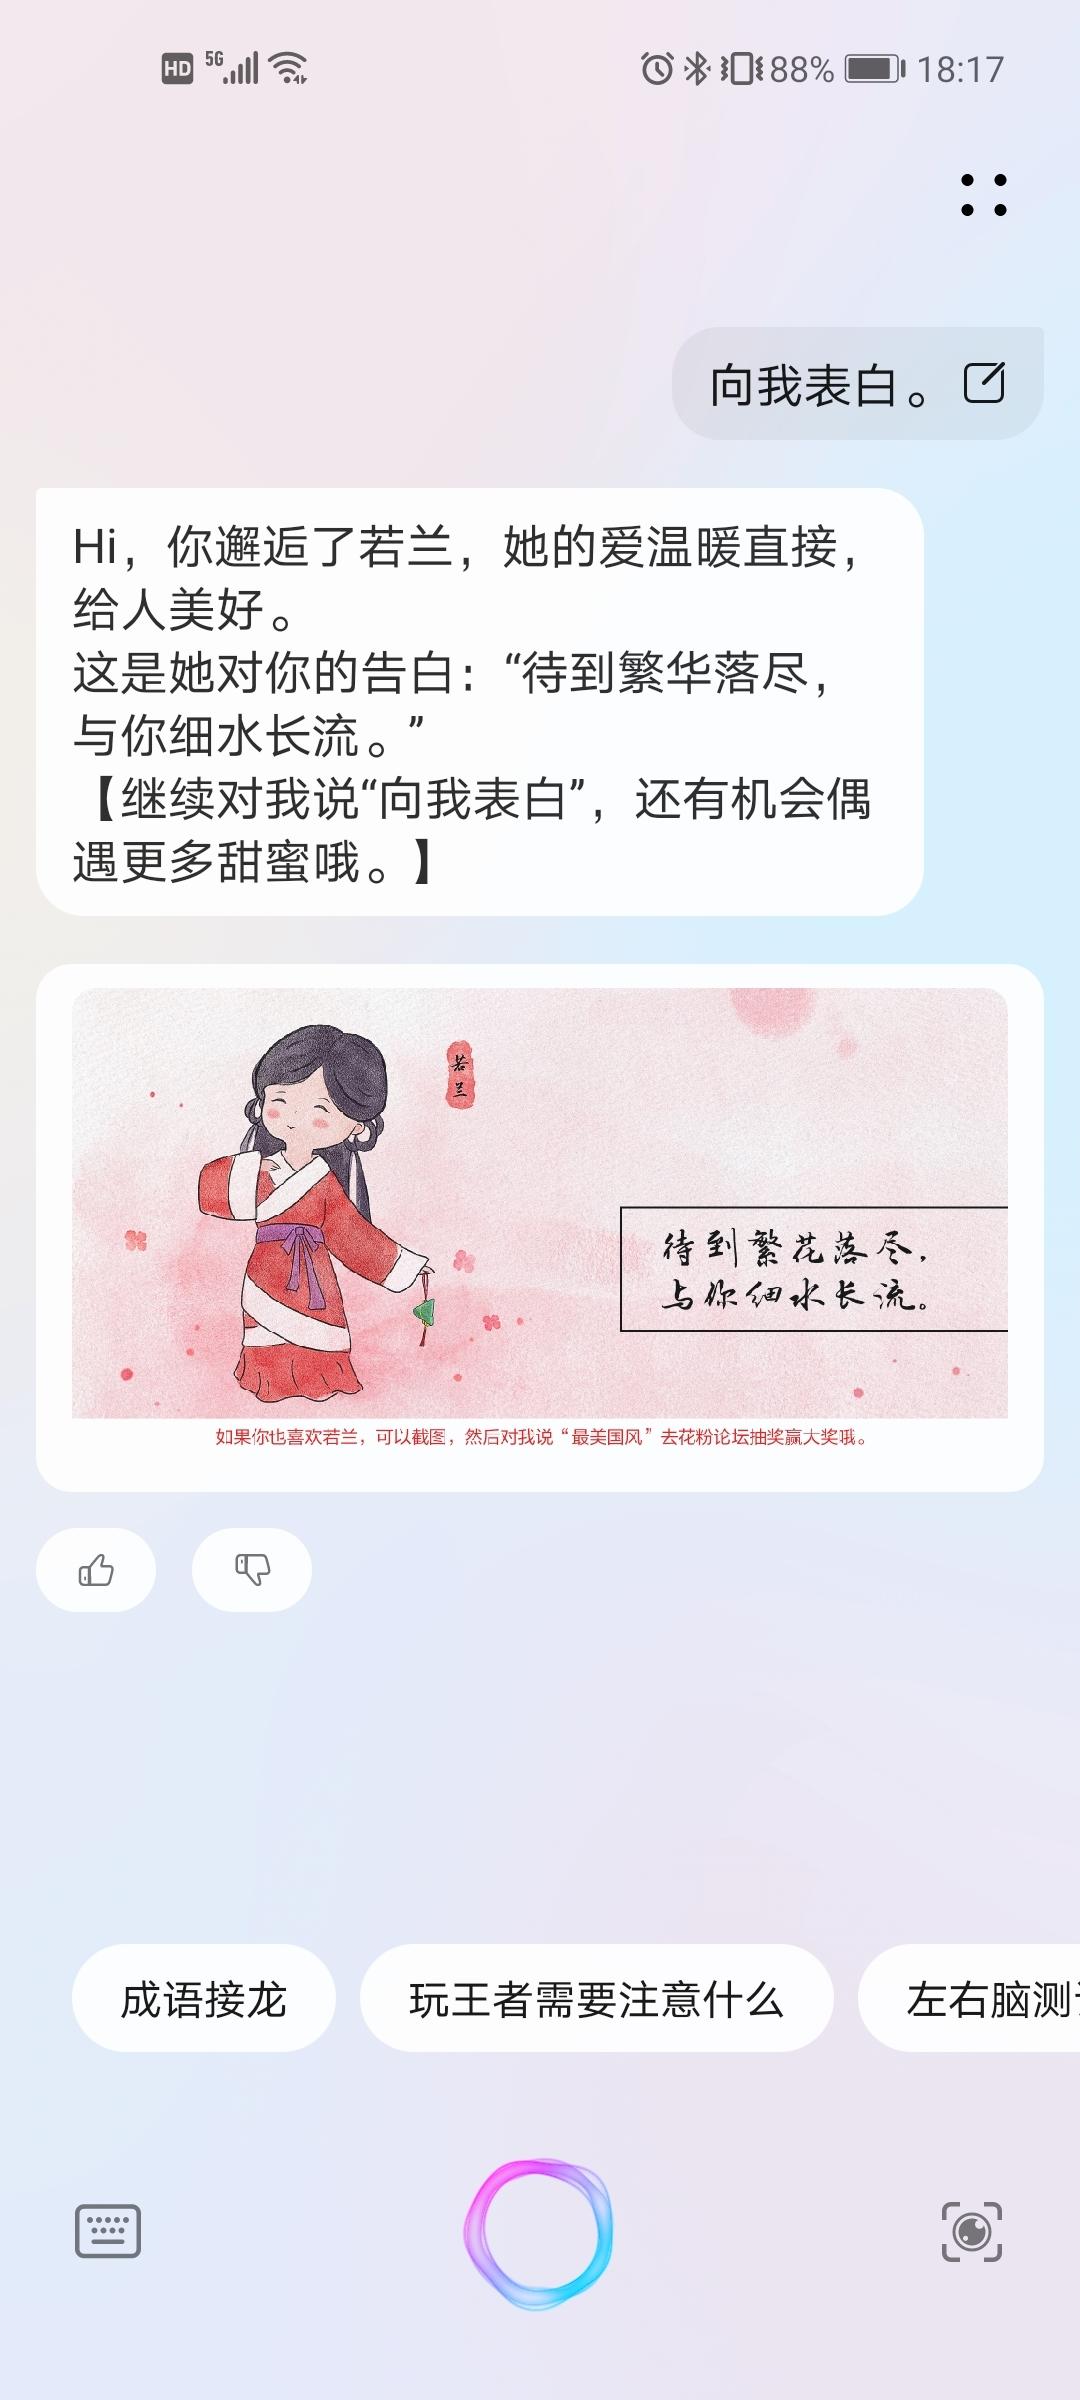 Screenshot_20210611_181748_com.huawei.vassistant.jpg